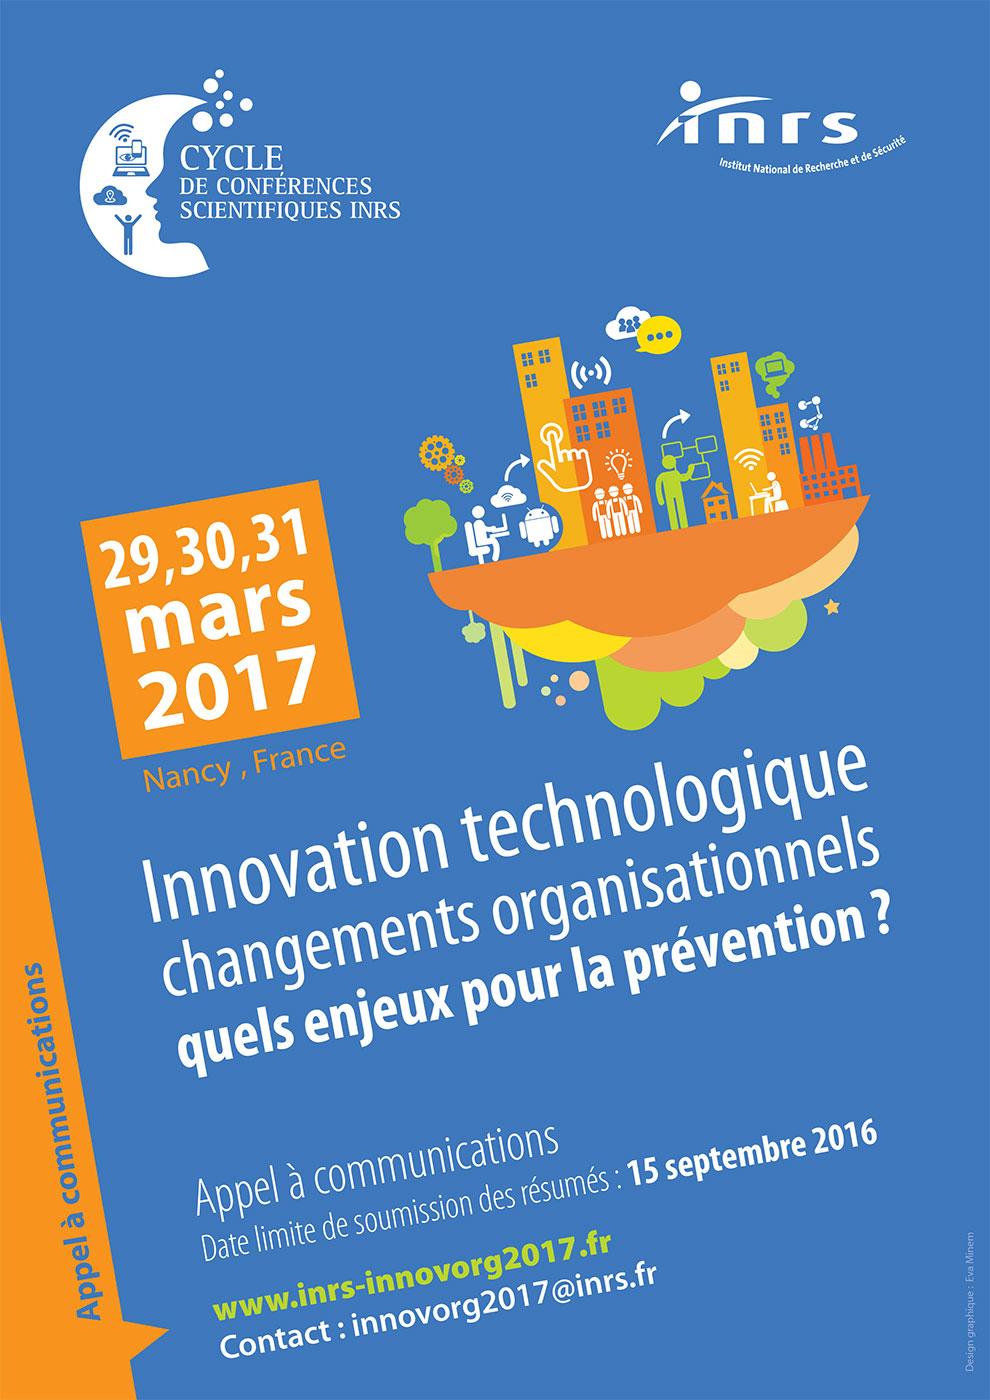 innovation technologique changements organisationnels